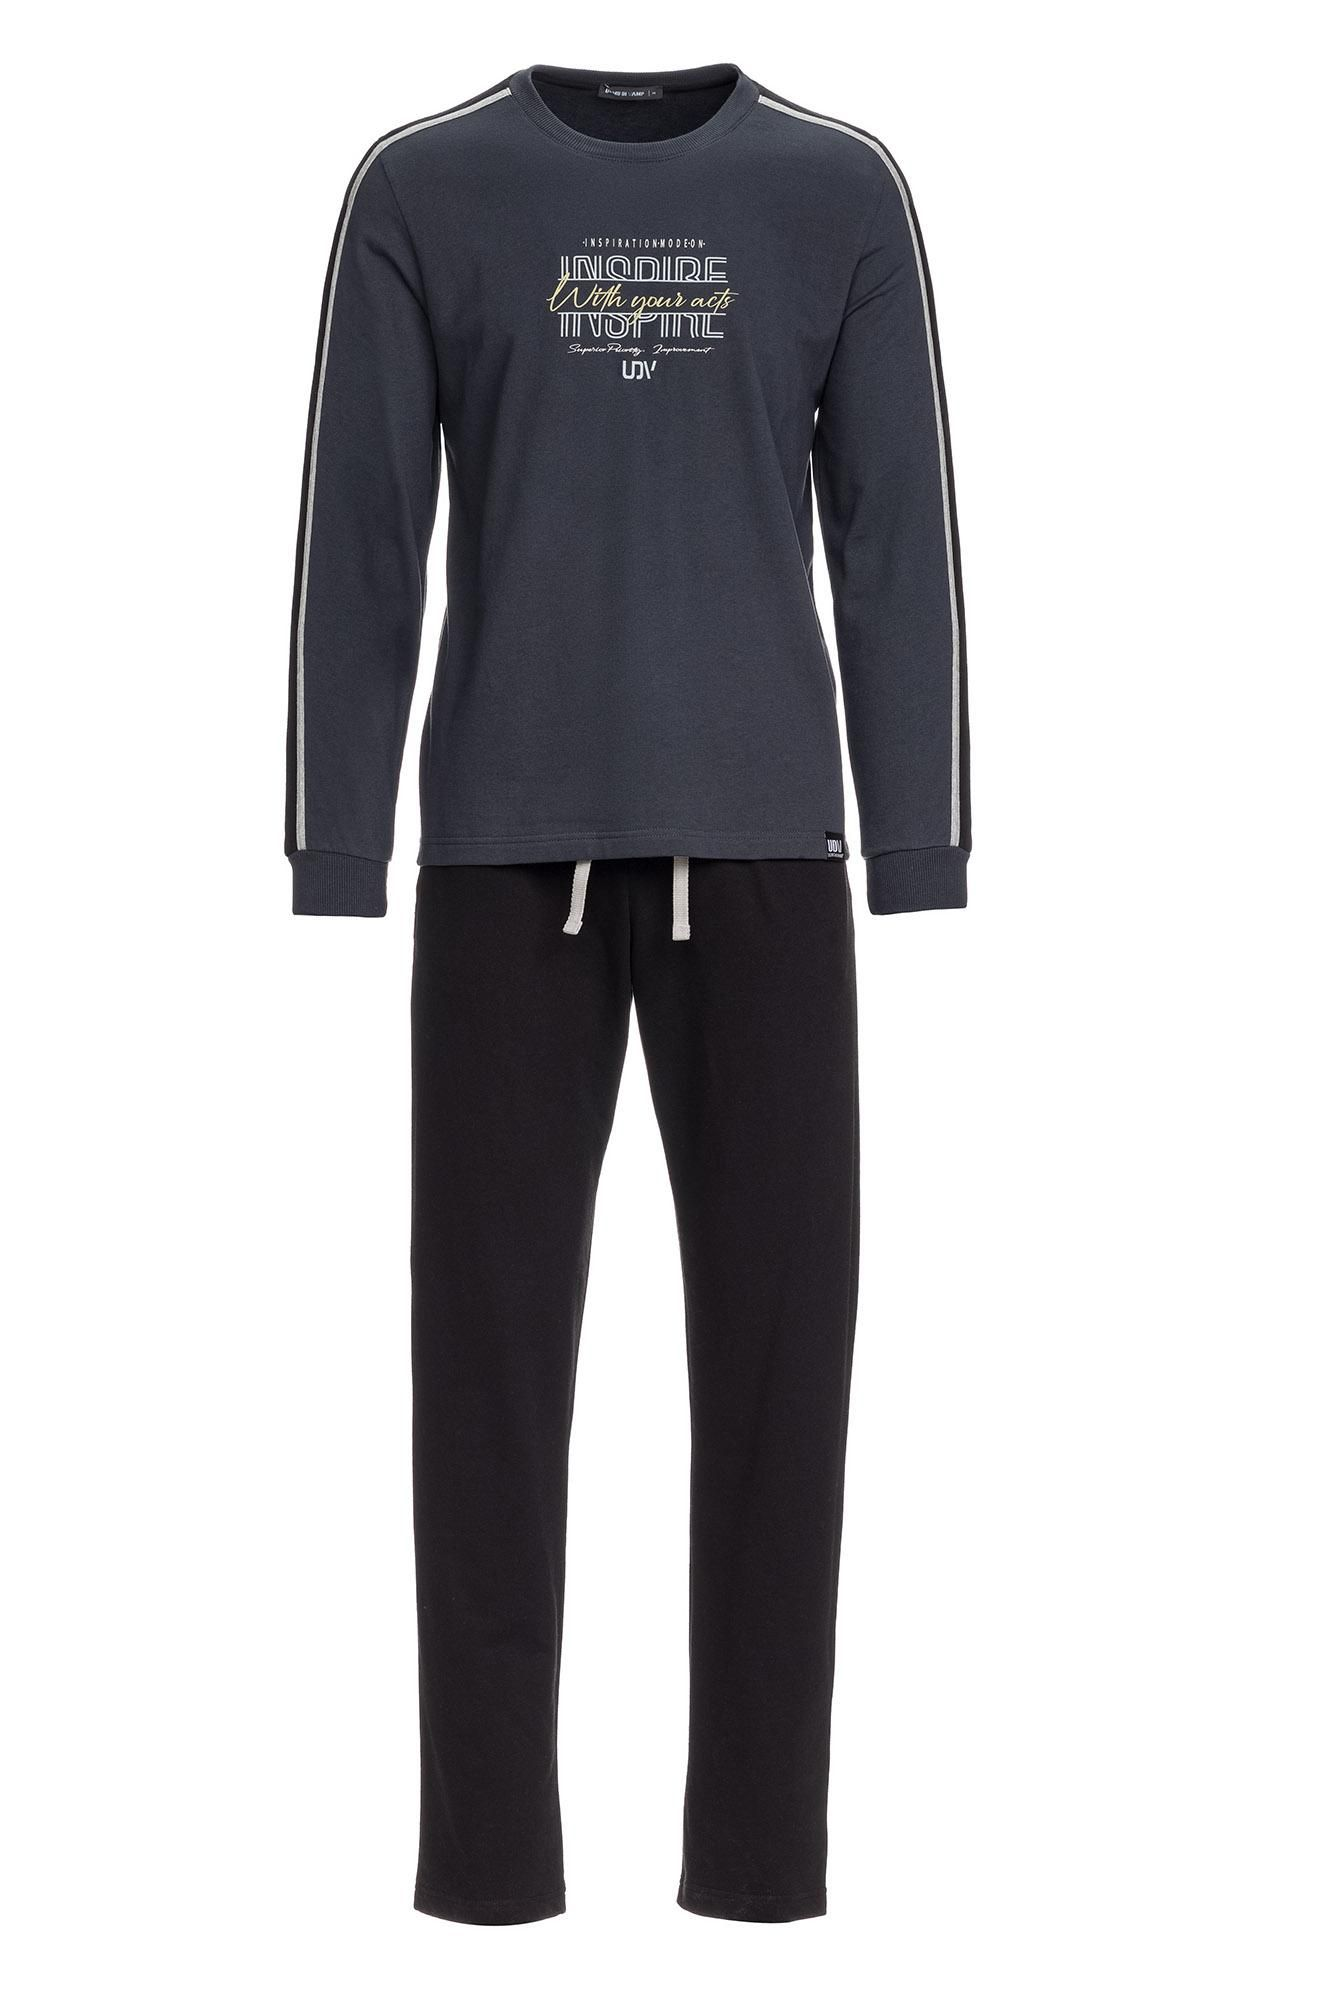 Men's Fleece Cotton Pyjamas